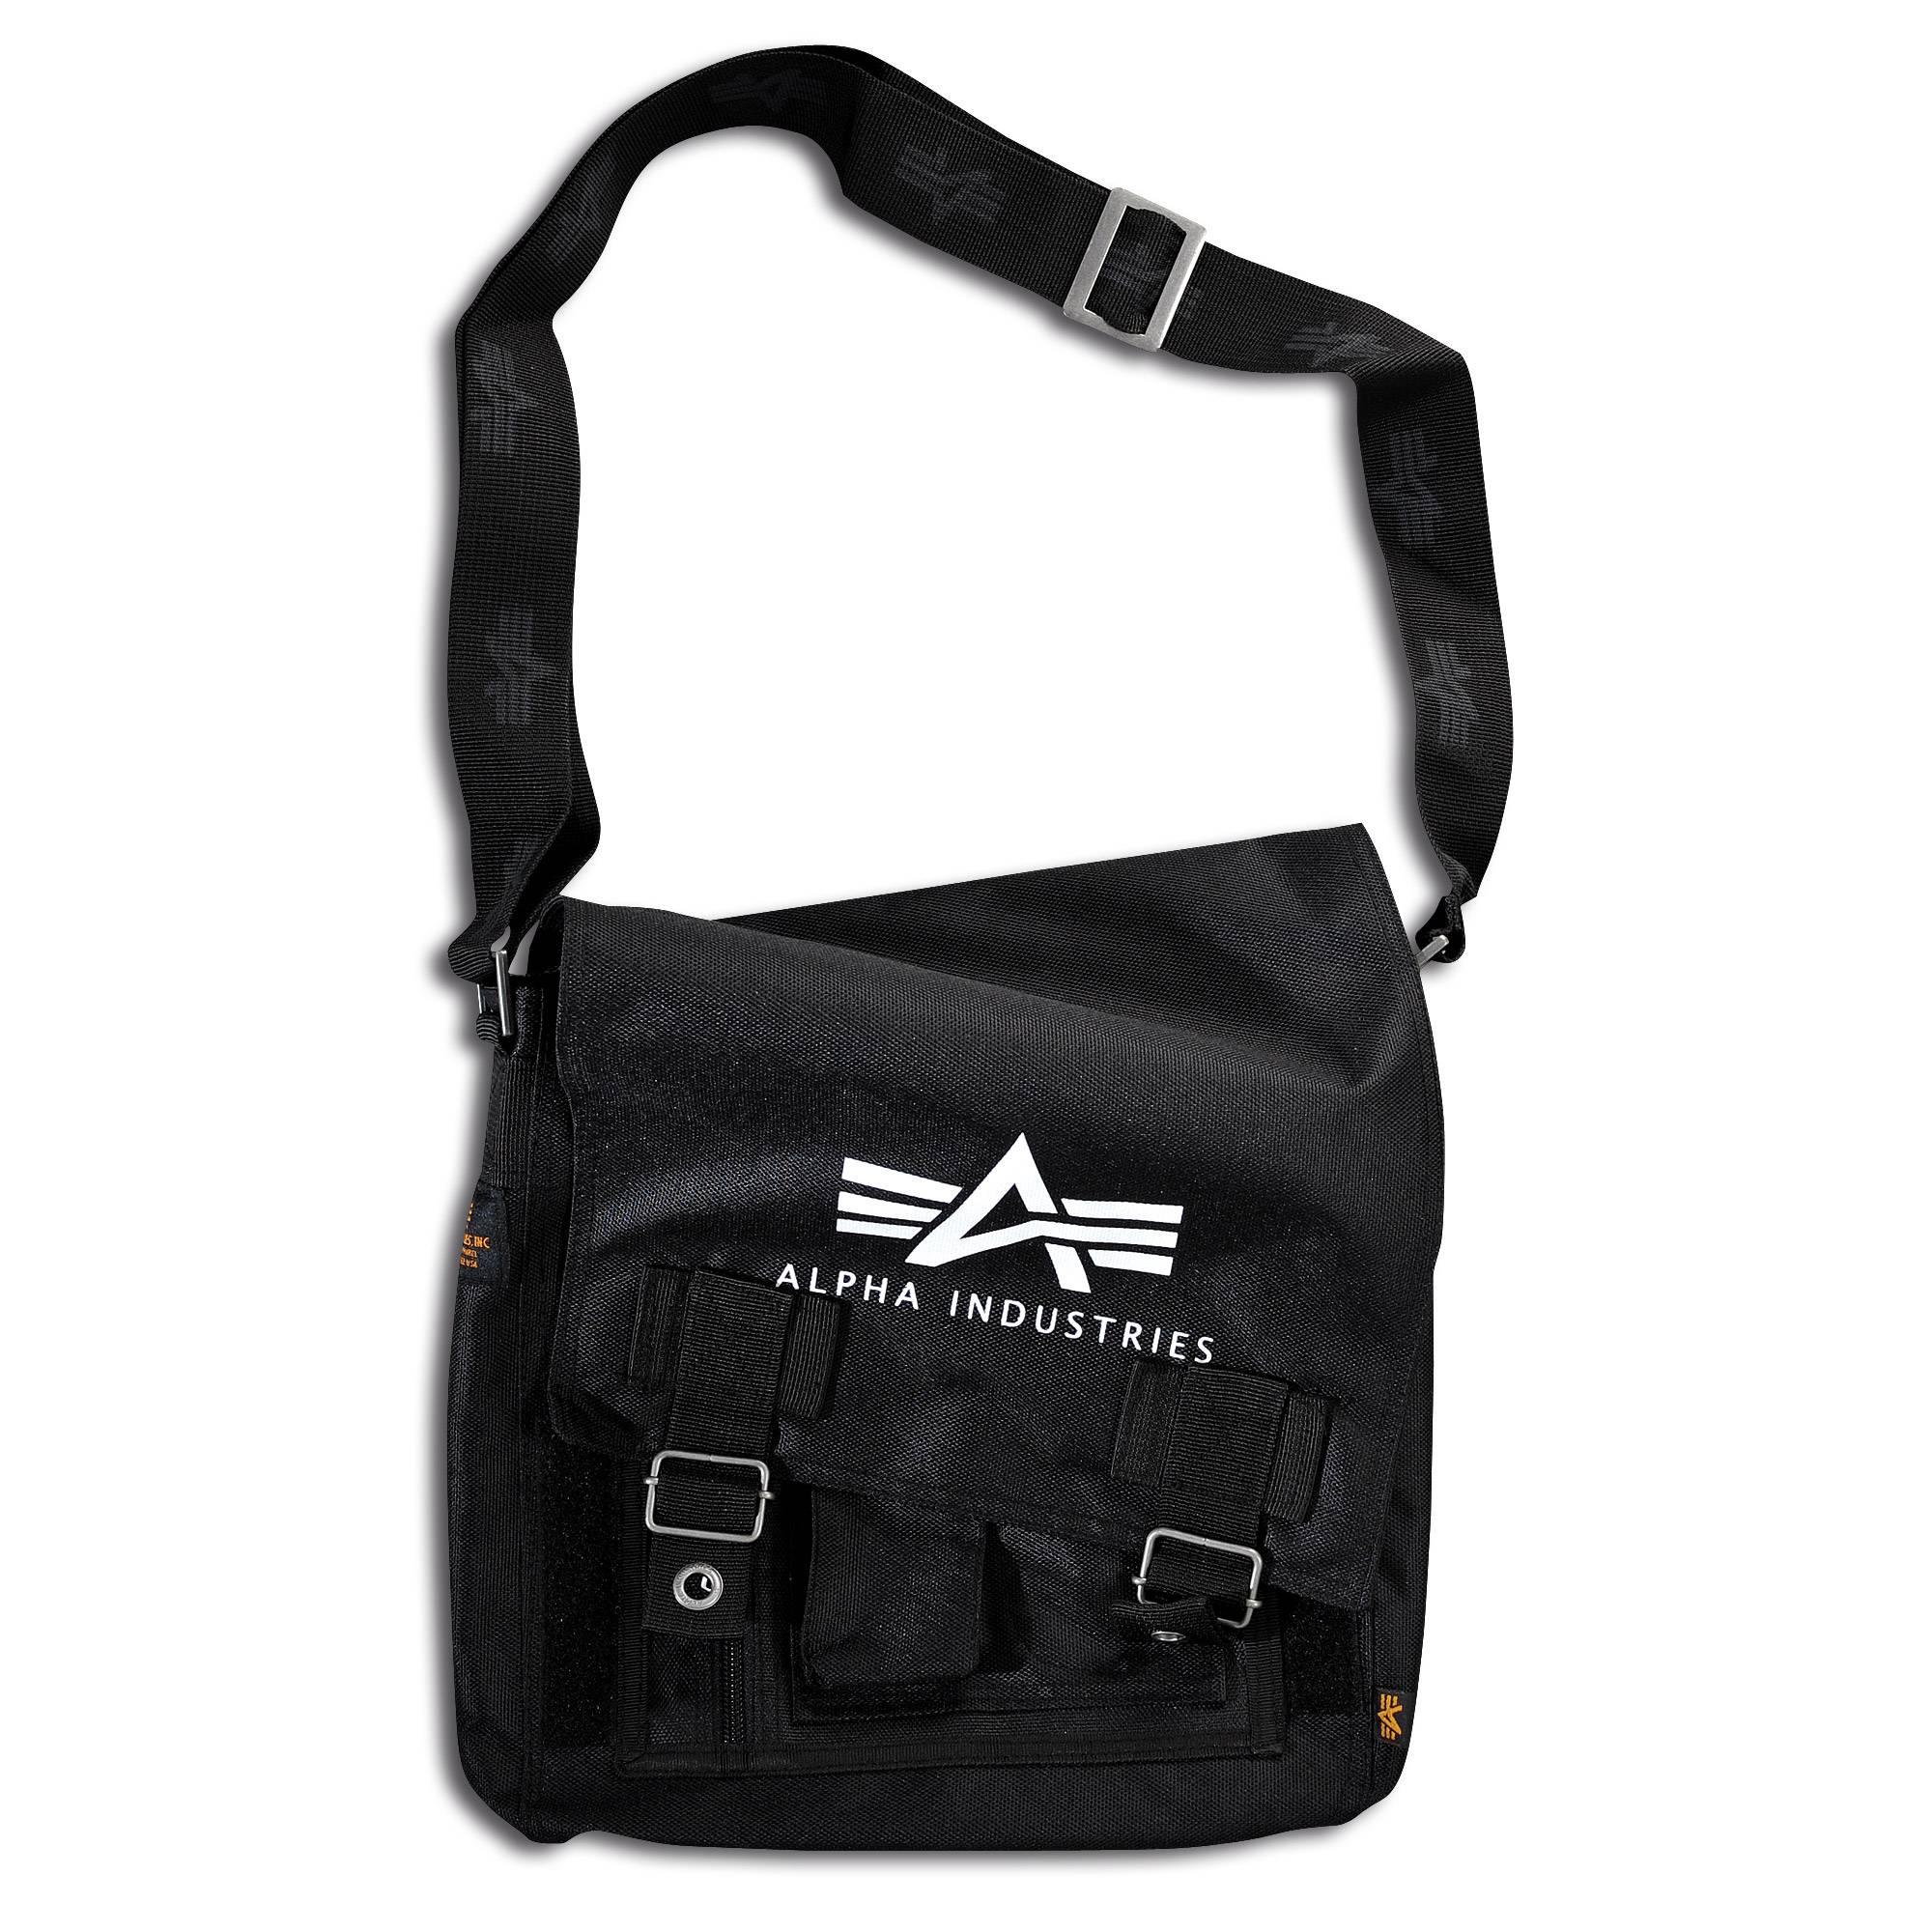 d296aa0c35 Alpha Industries Big A Oxford Utility Bag schwarz kaufen bei ASMC